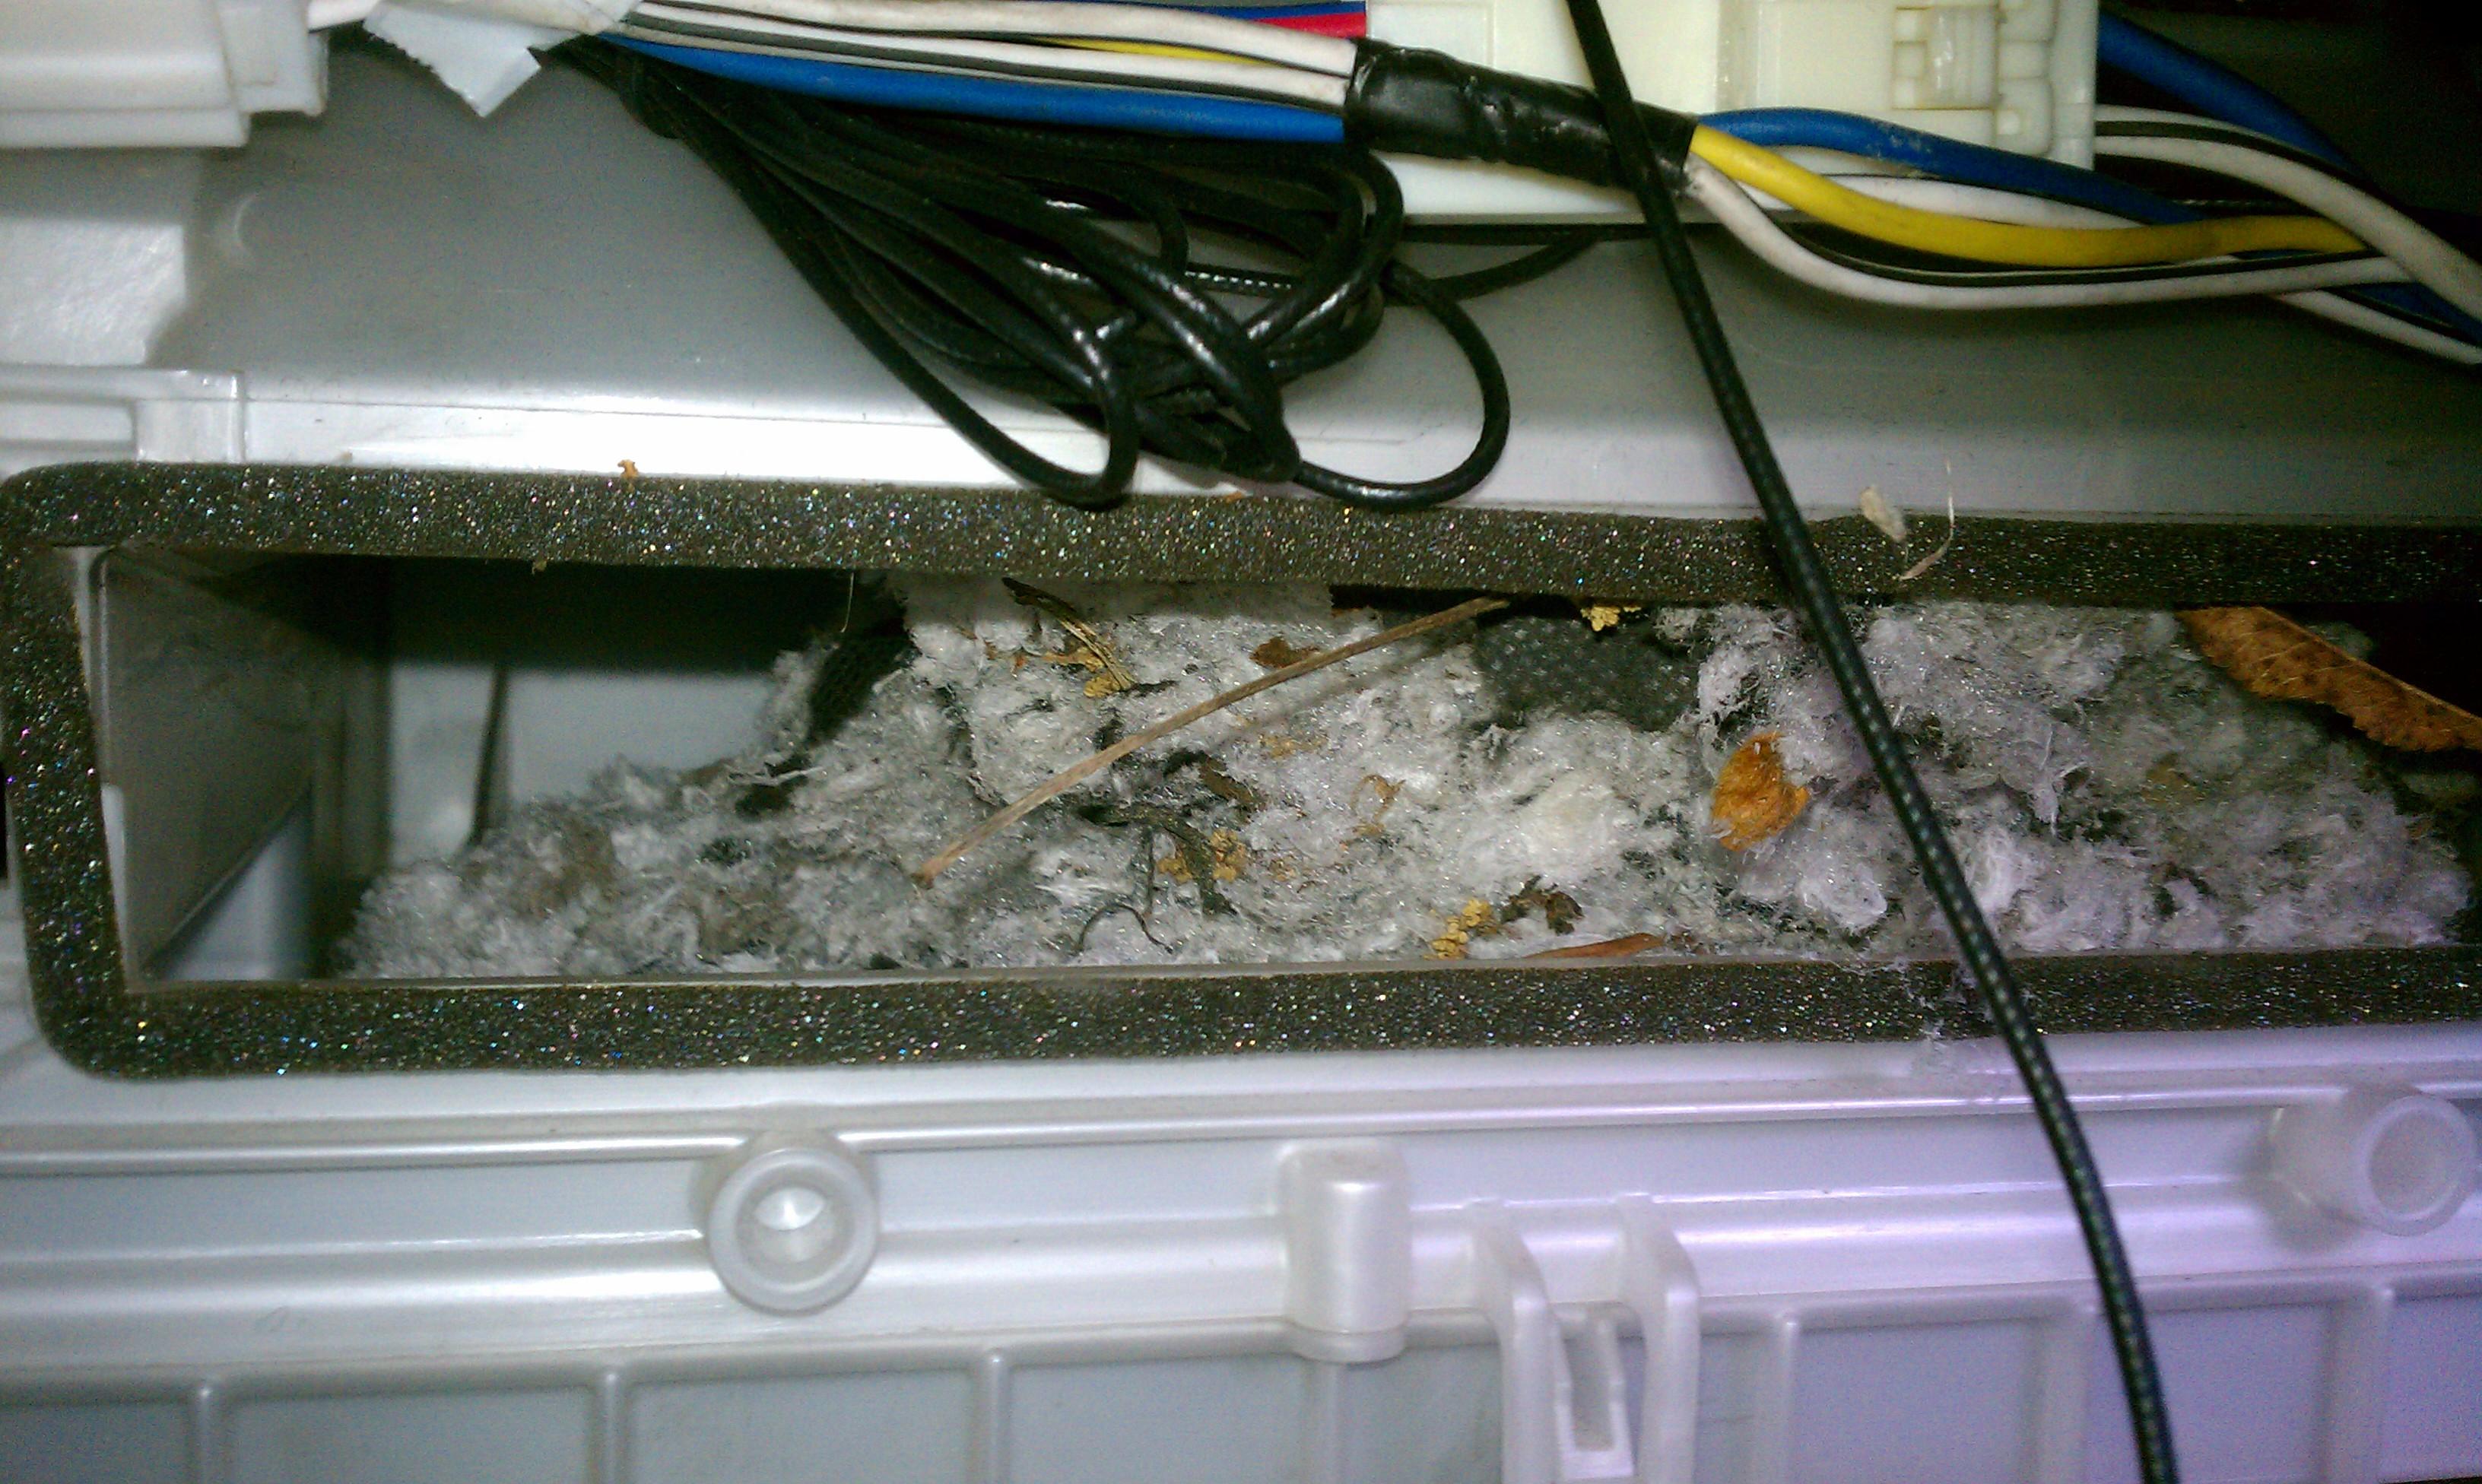 San Francisco Toyota Service >> Toyota Prius 2006 air conditioning ventilation service | PriusChat